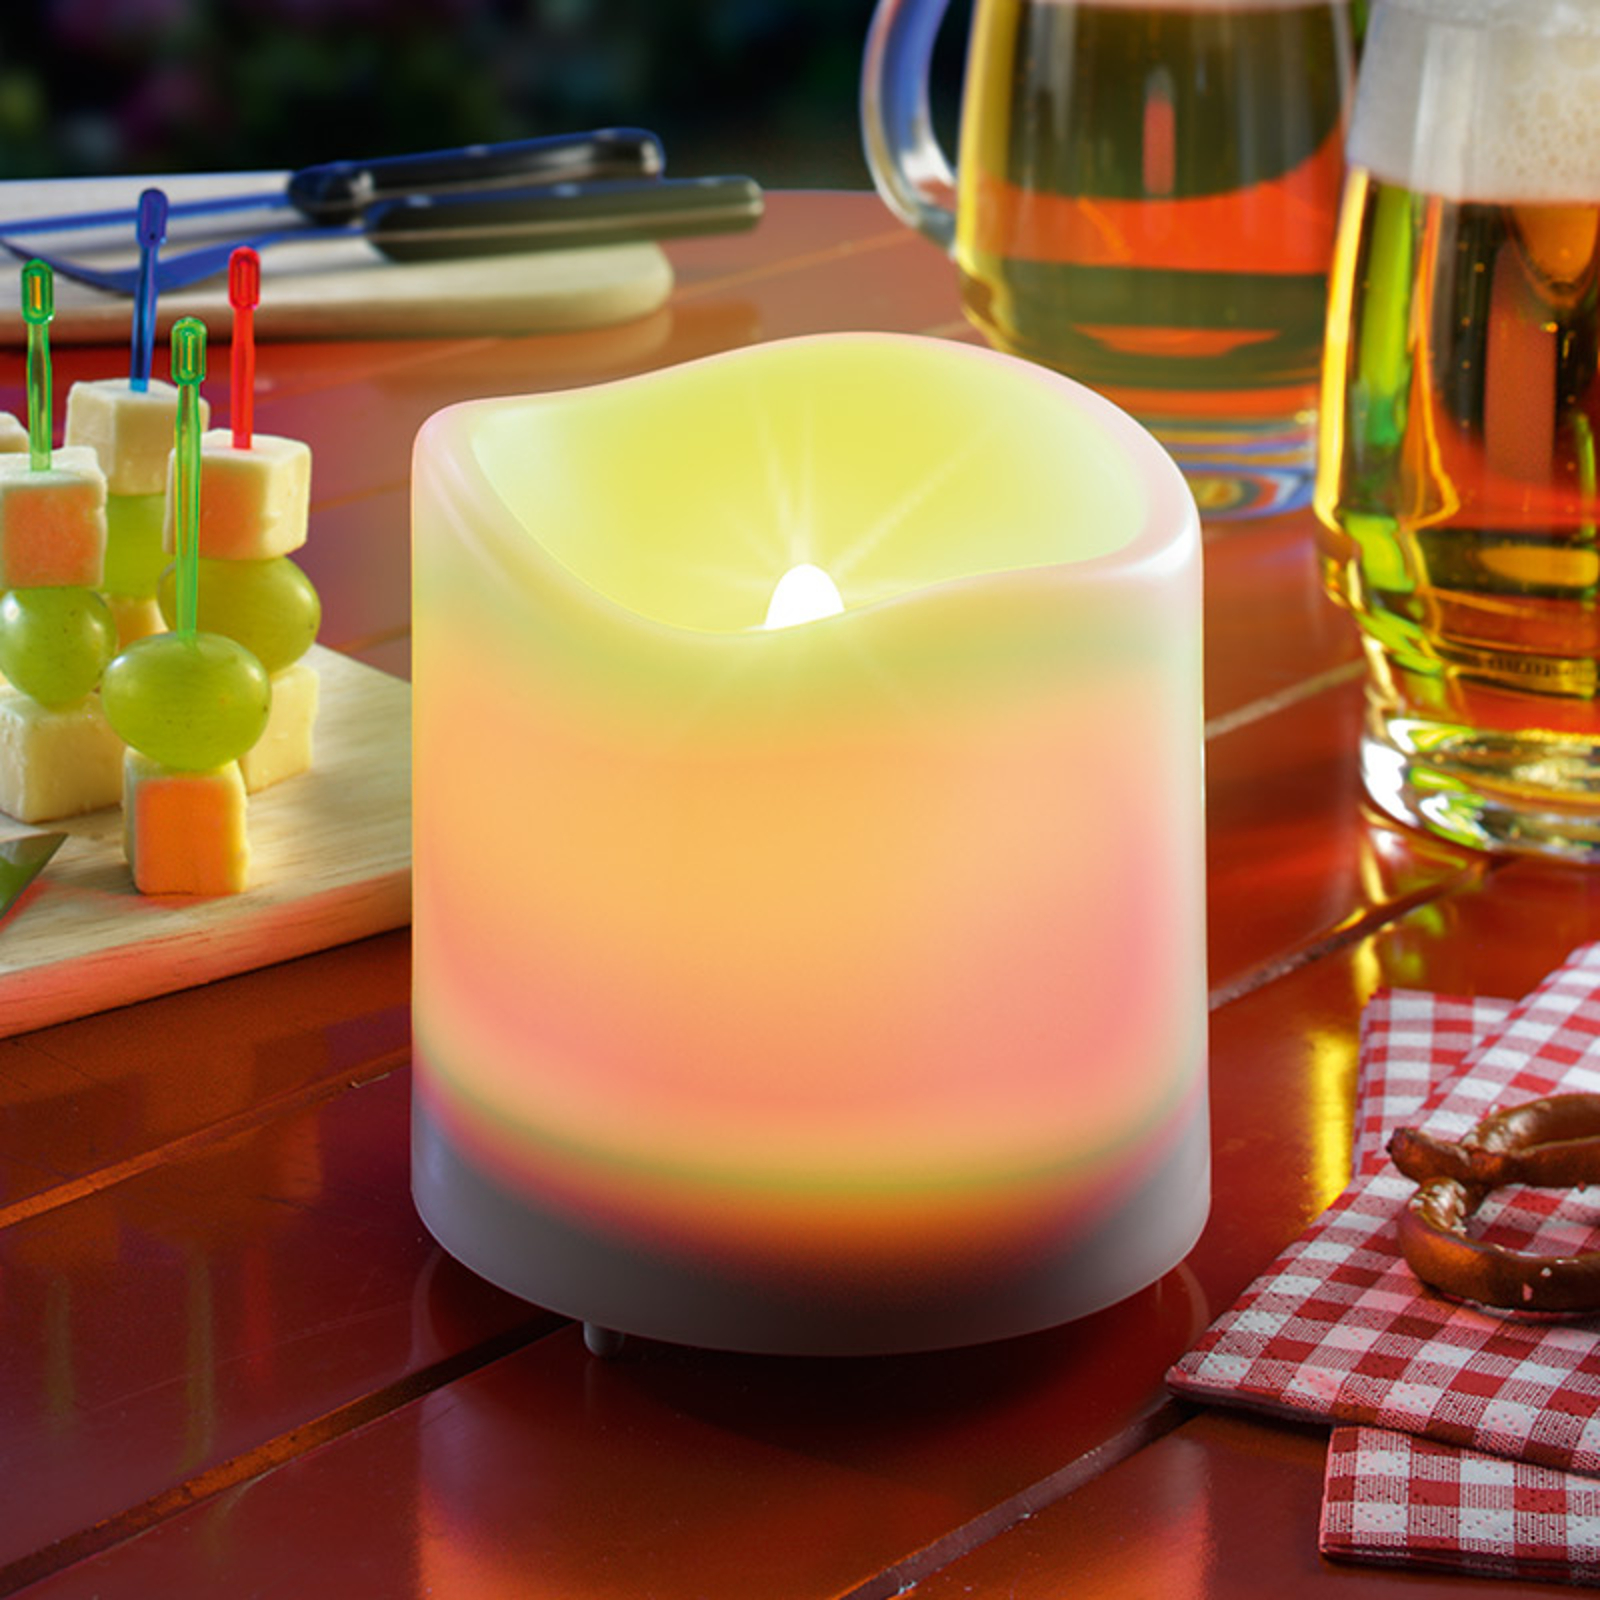 Biela LED solárna sviečka Candle Light_3012228_1